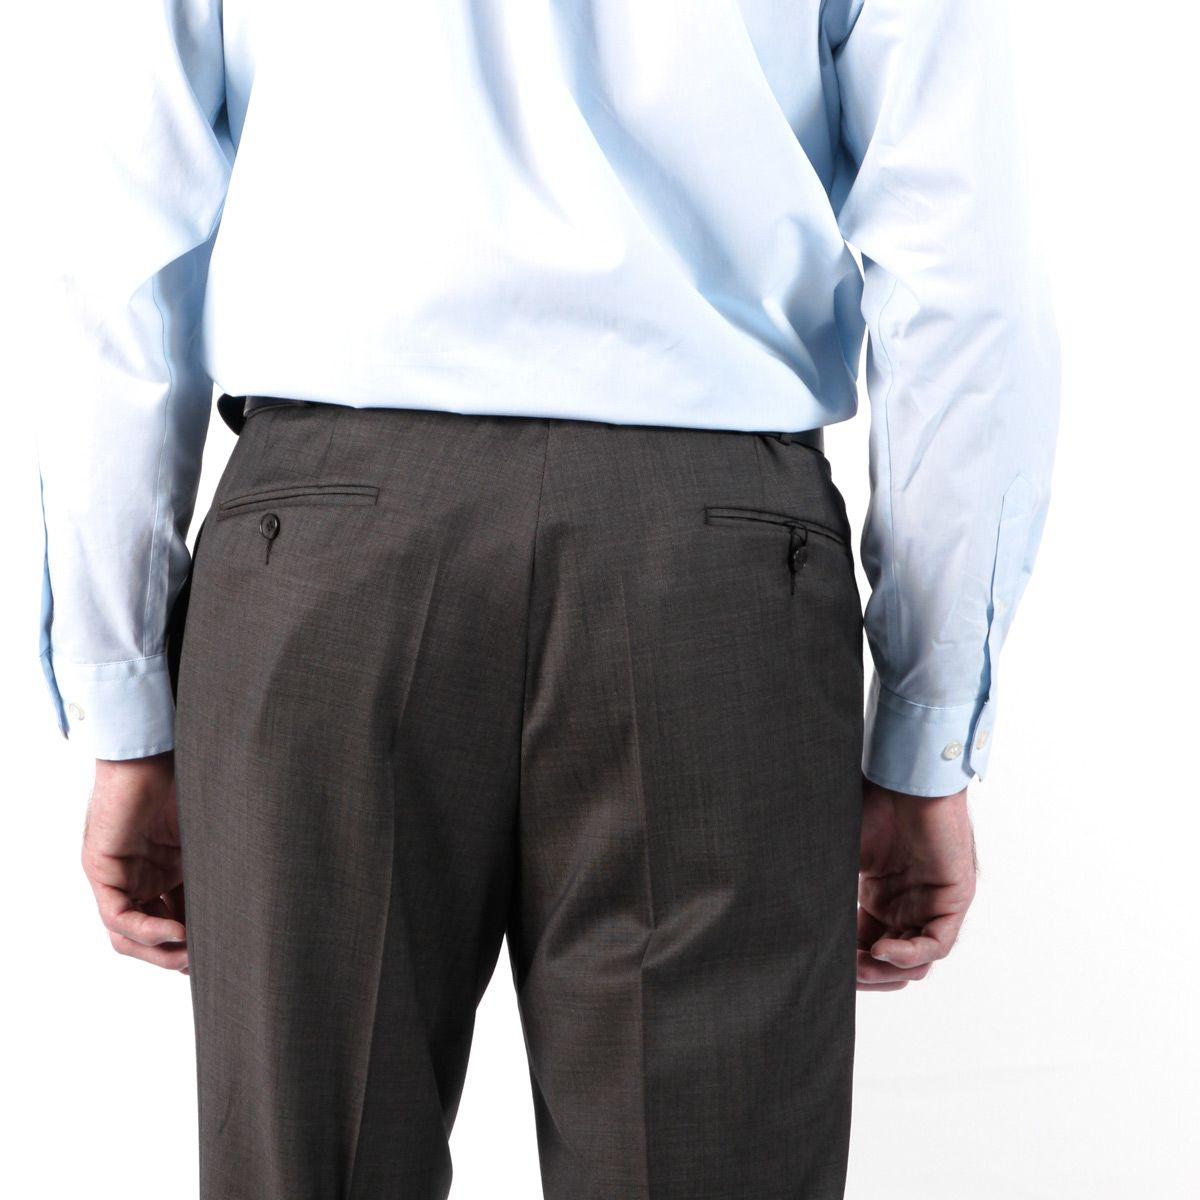 Guide taille pantalon